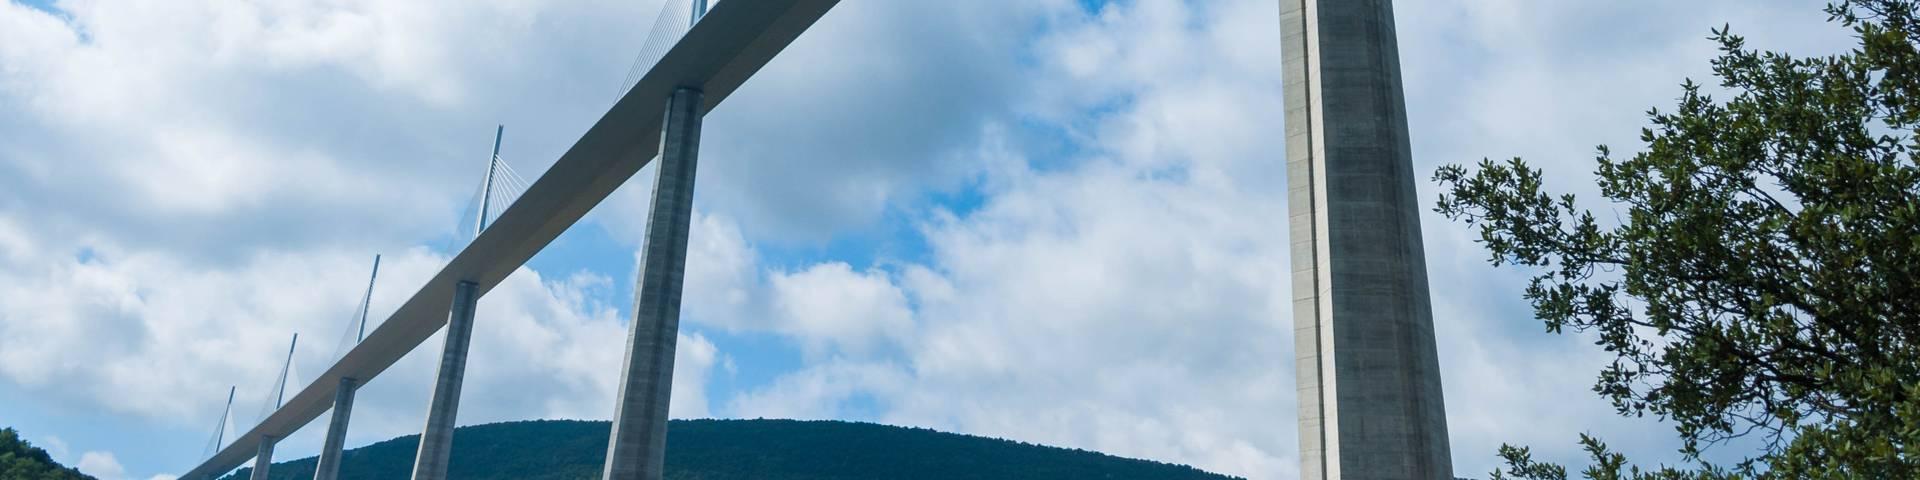 le Viaduc de Millau vu d'en bas